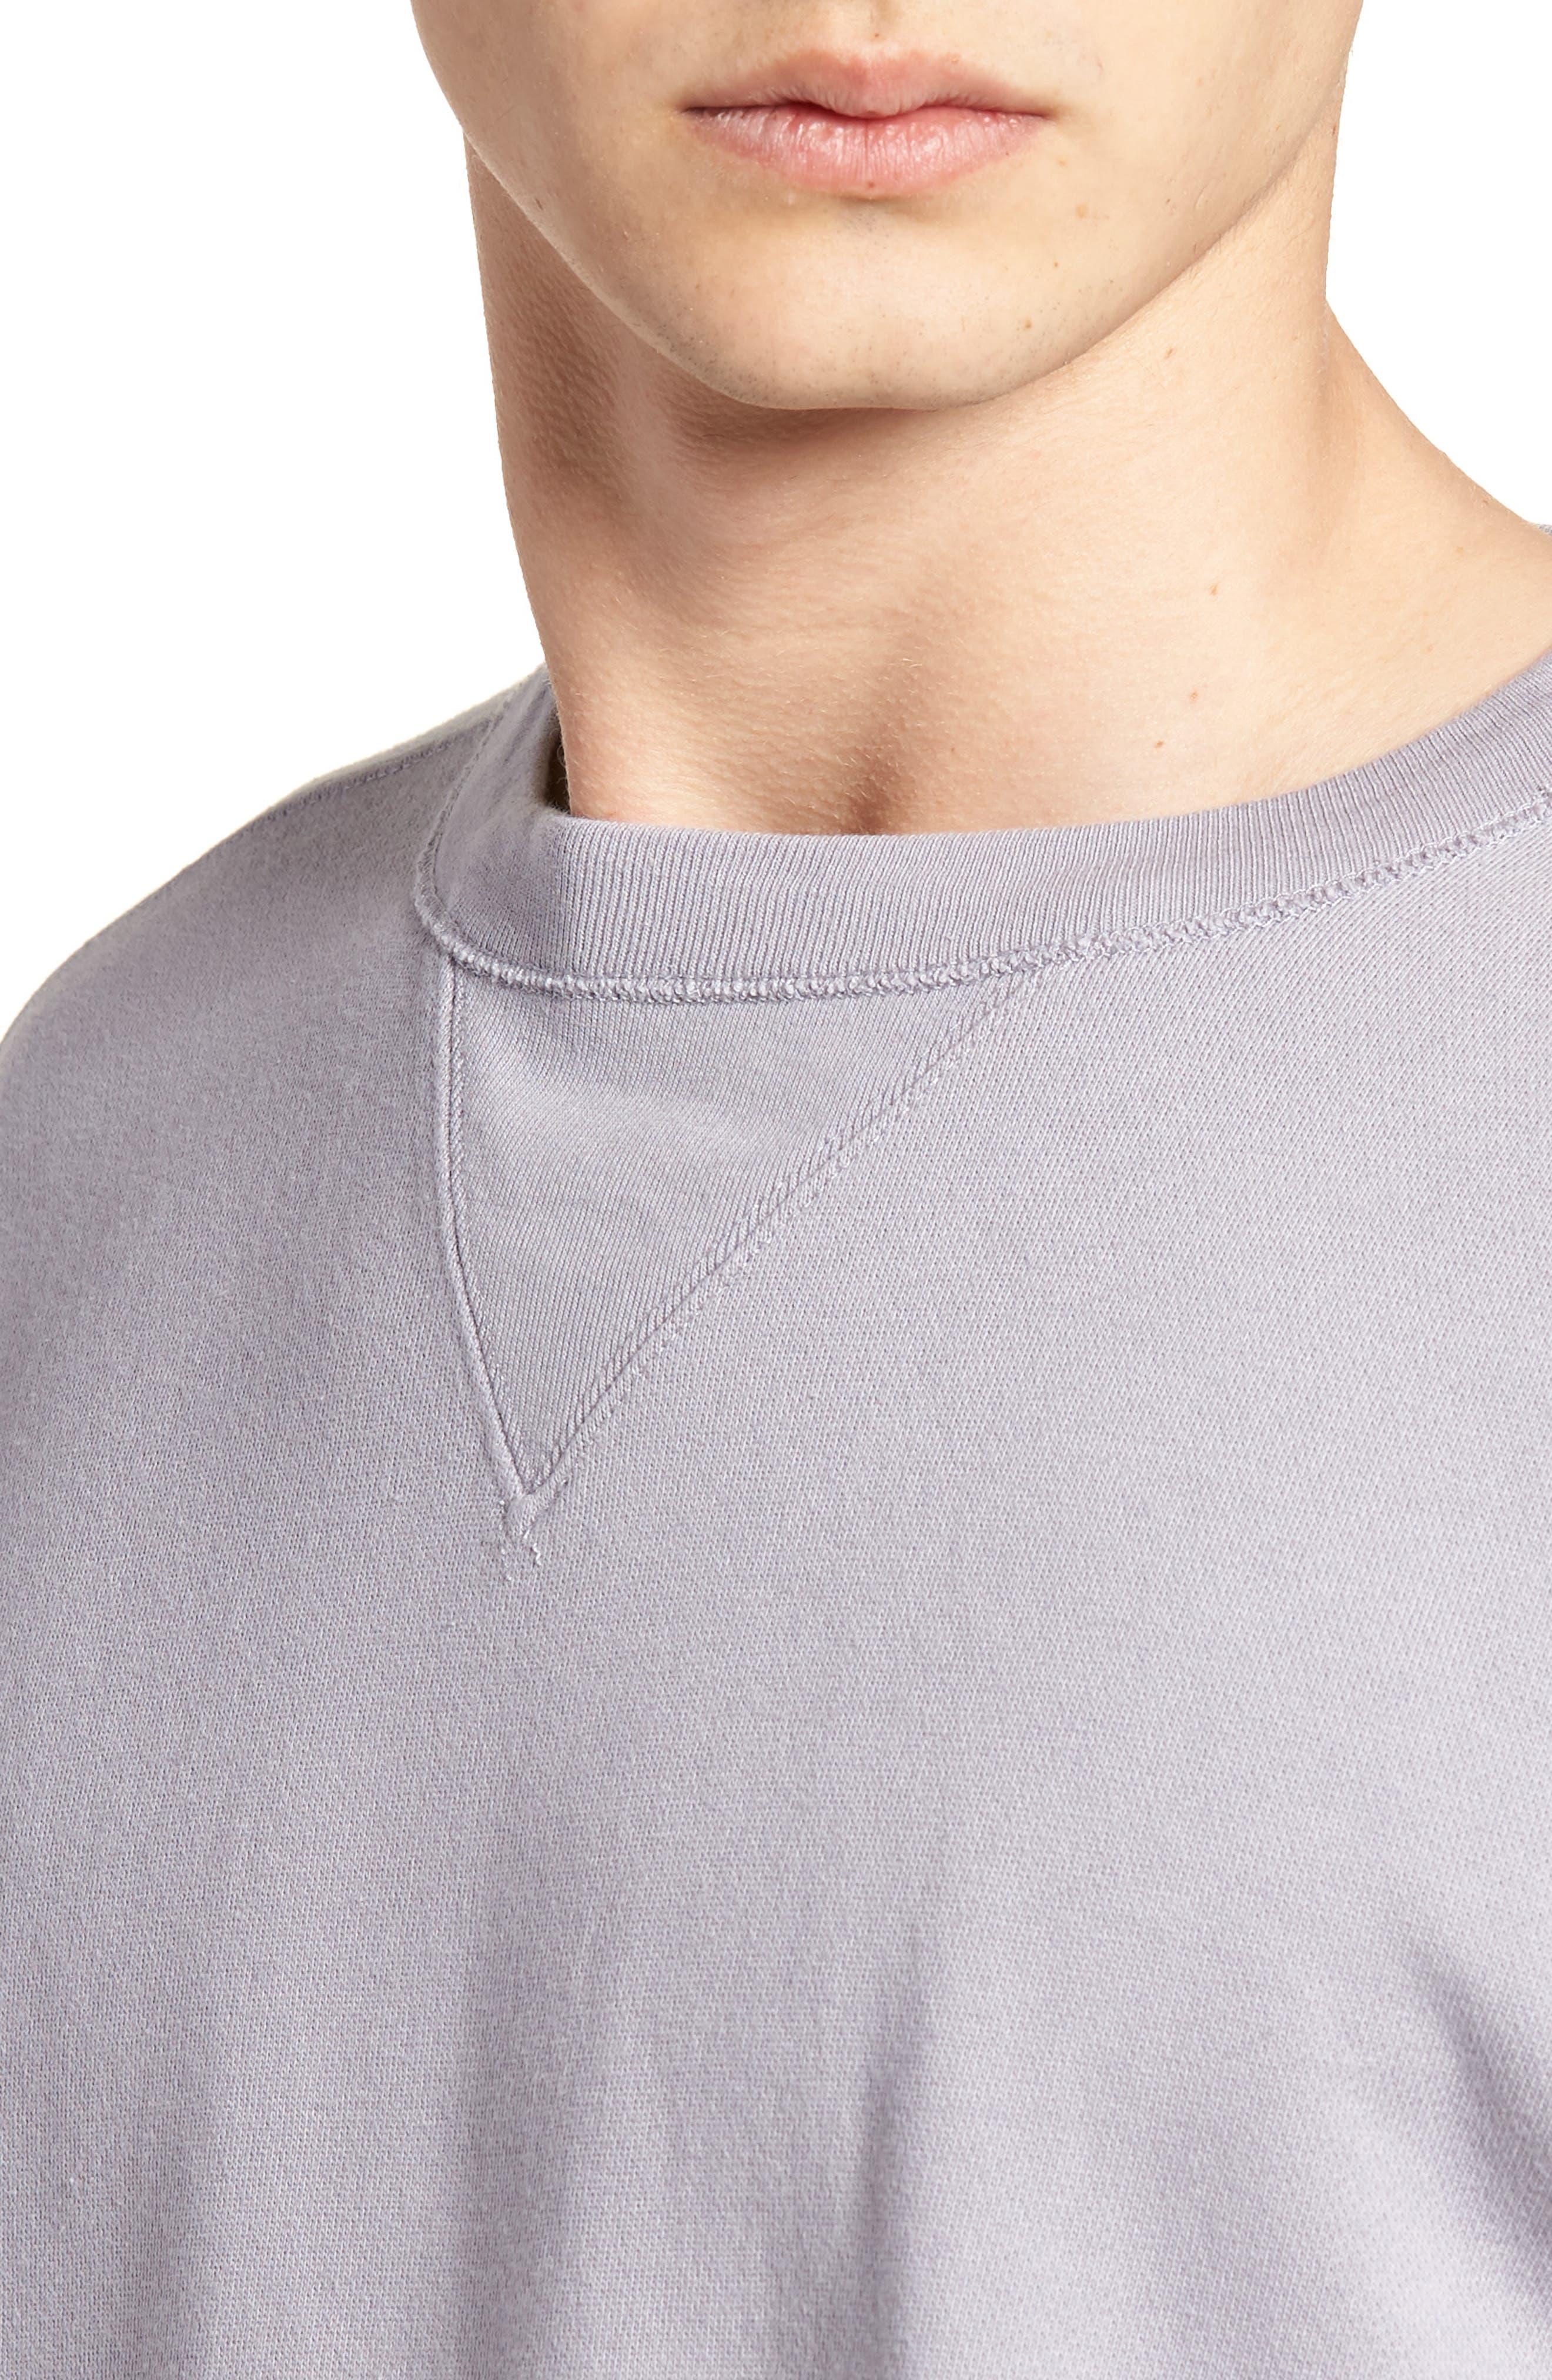 Bay Meadows Sweatshirt,                             Alternate thumbnail 4, color,                             Quiksilver